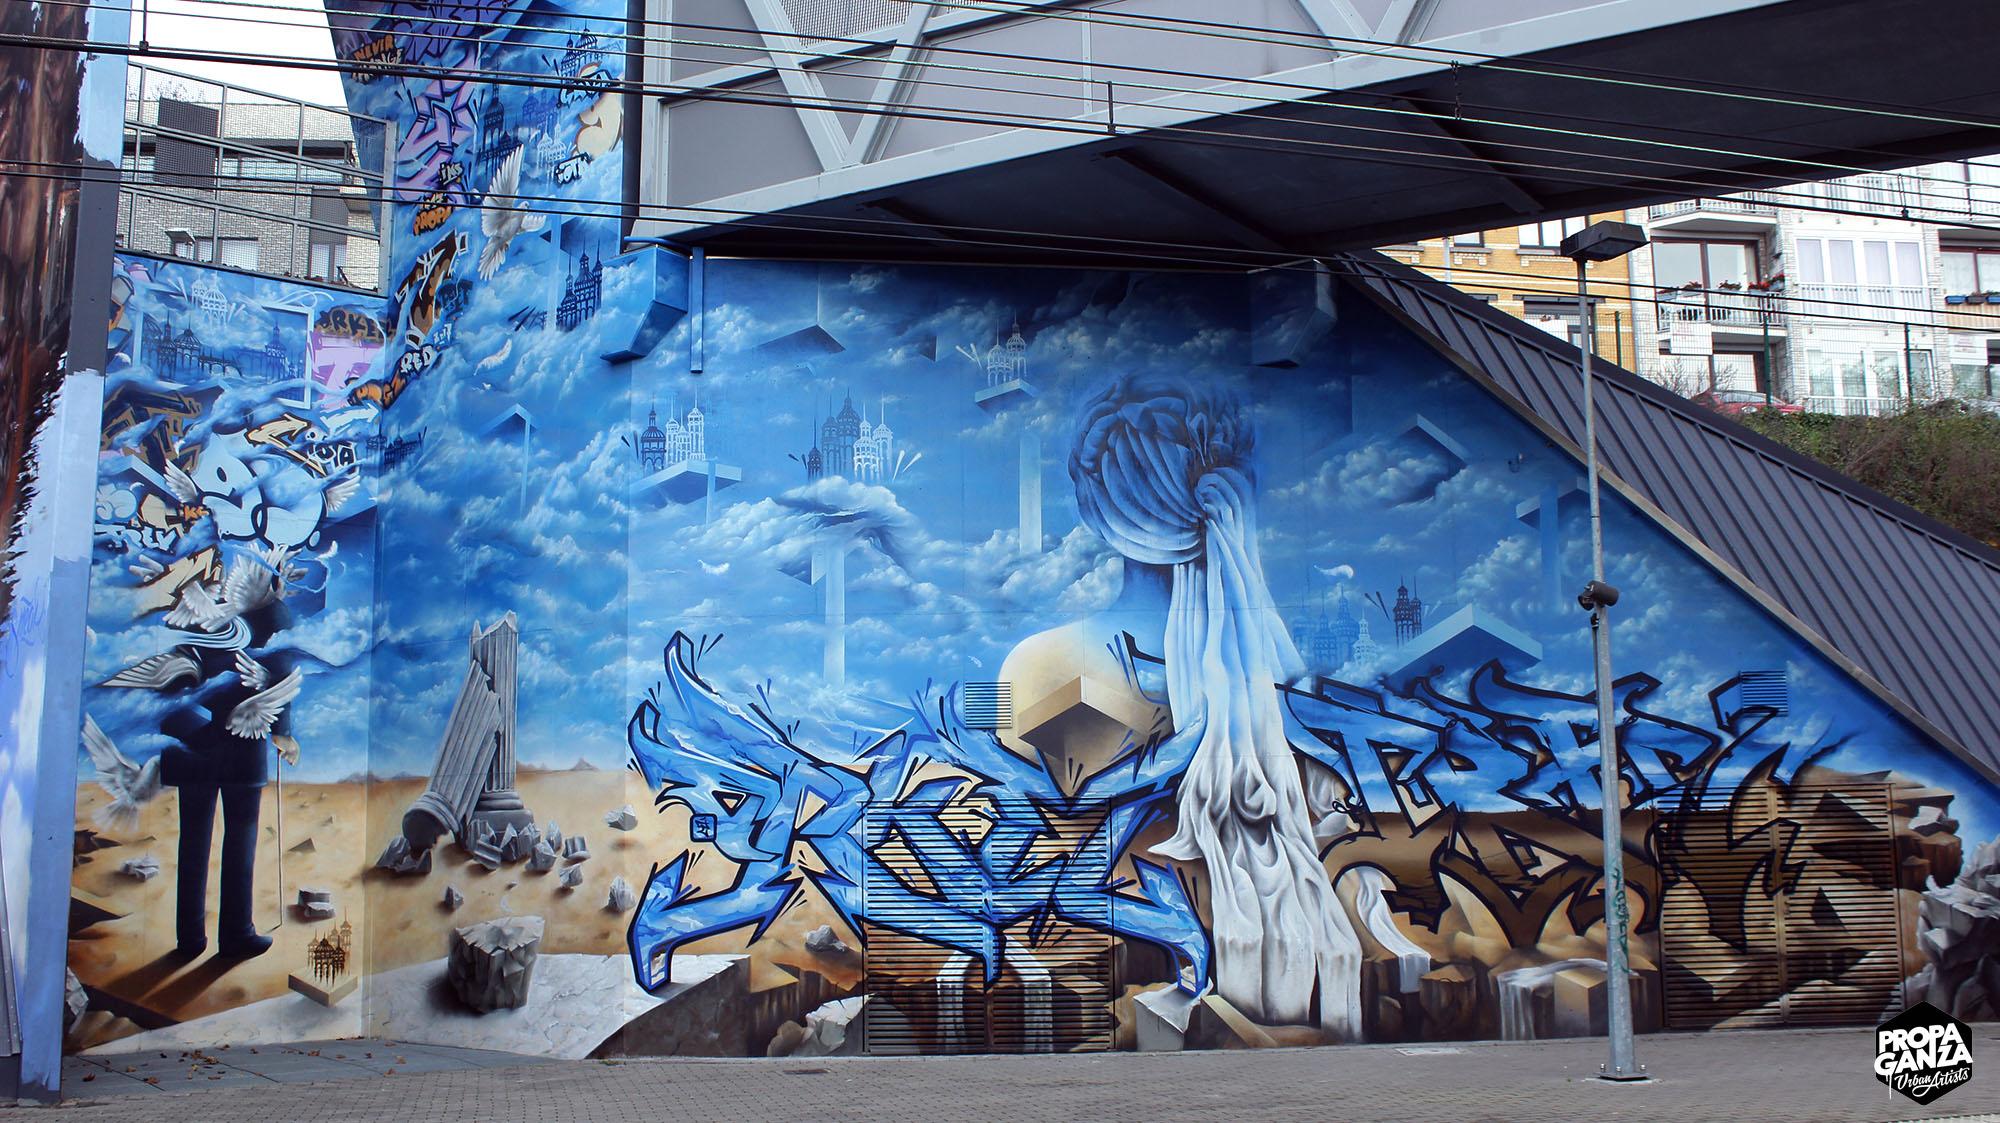 https://www.propaganza.be/wp-content/uploads/2016/05/propaganza-vivier-d-oie-uccle-belgium-graffiti-spraypaint-street-art-fresque-magritte-orkez-trevor-roubens-iota-piet-rodriguez-1.jpg